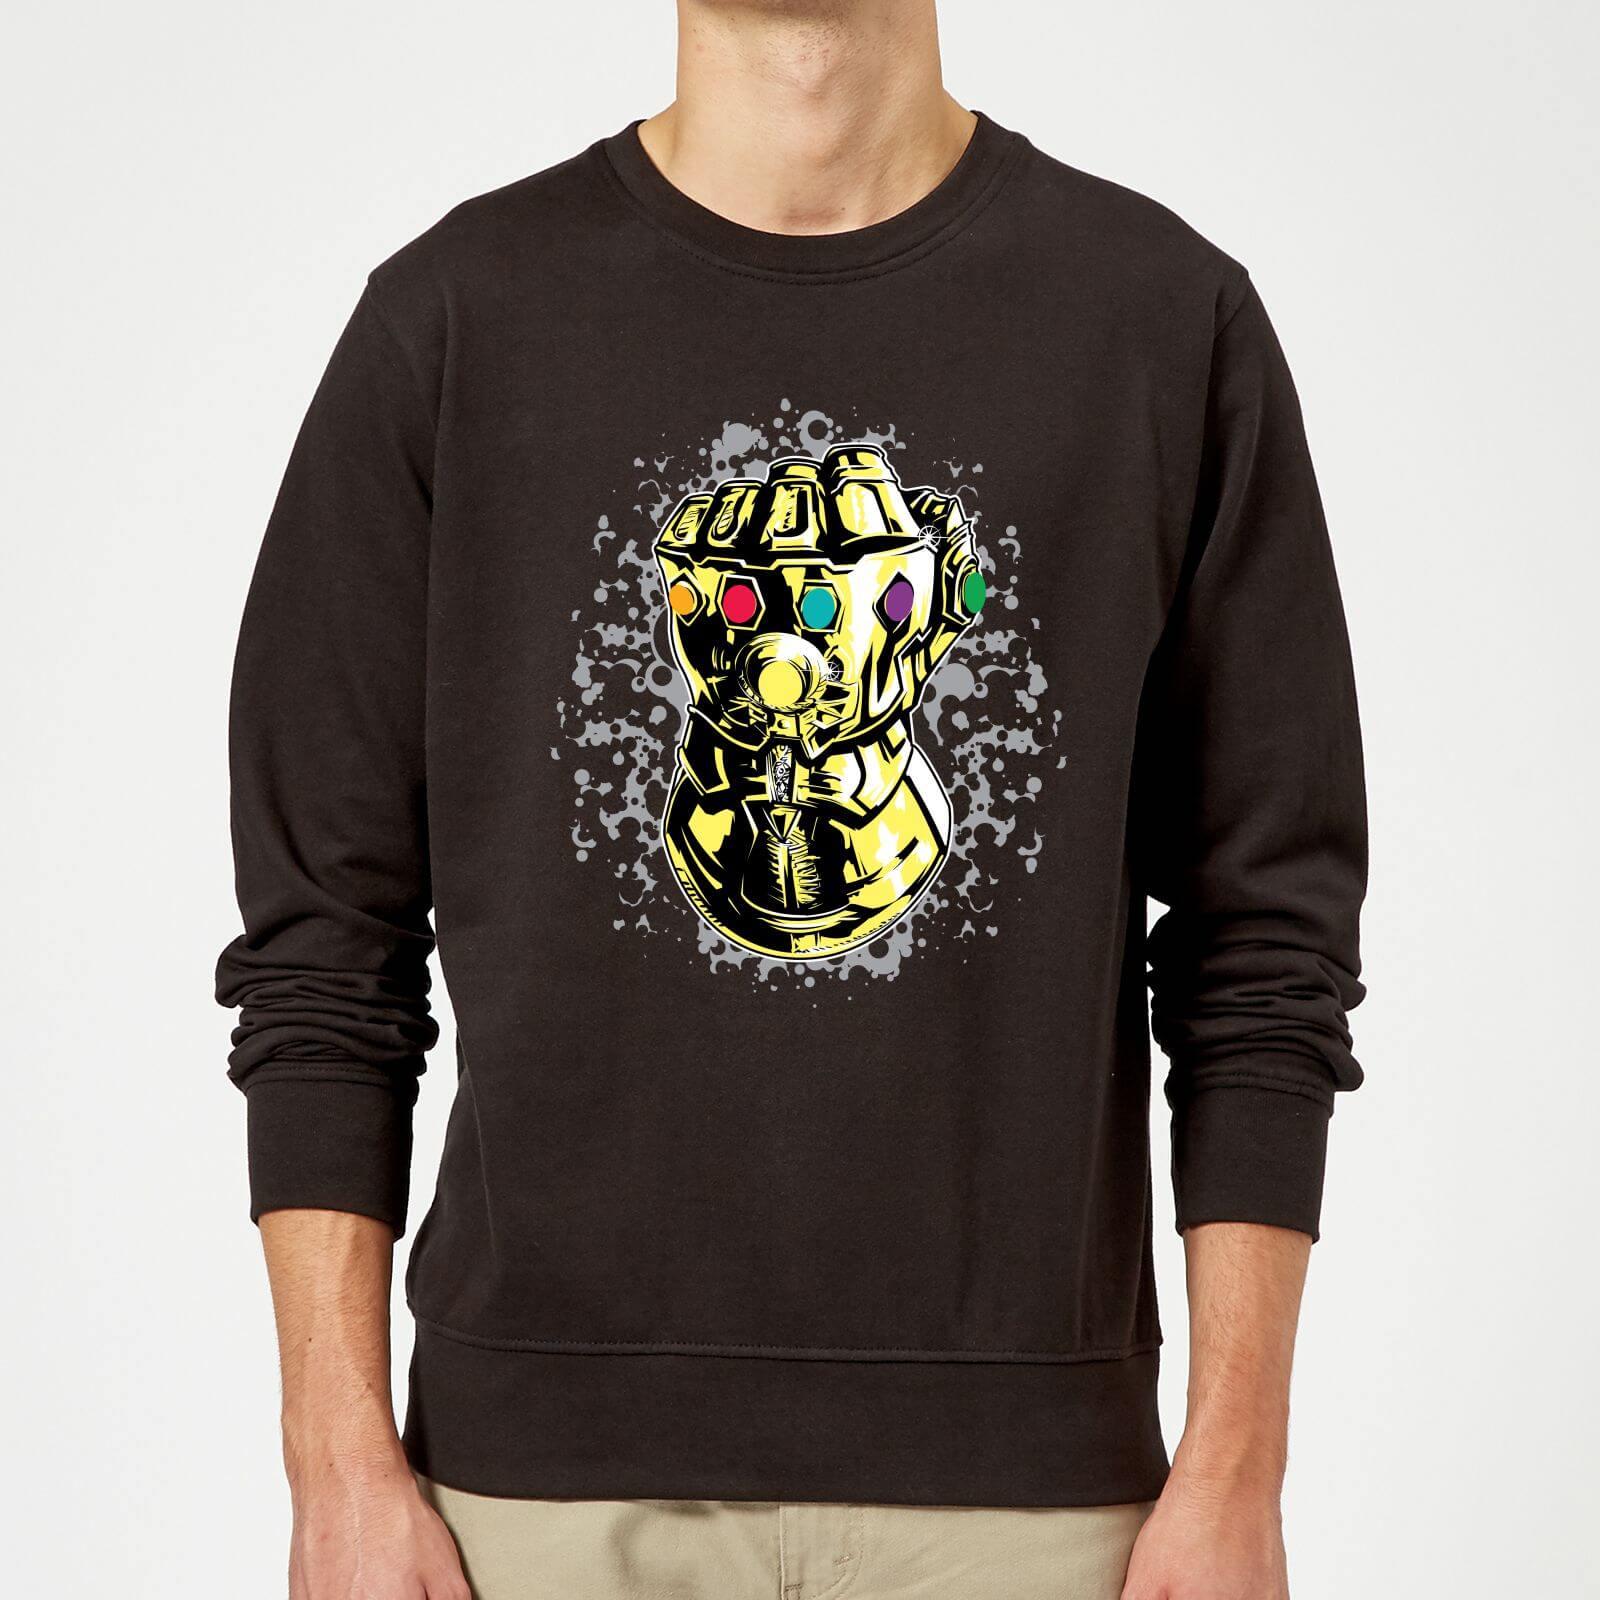 8ecb283454da Marvel Avengers Infinity War Fist Comic Sweatshirt - Black Clothing   Zavvi  US